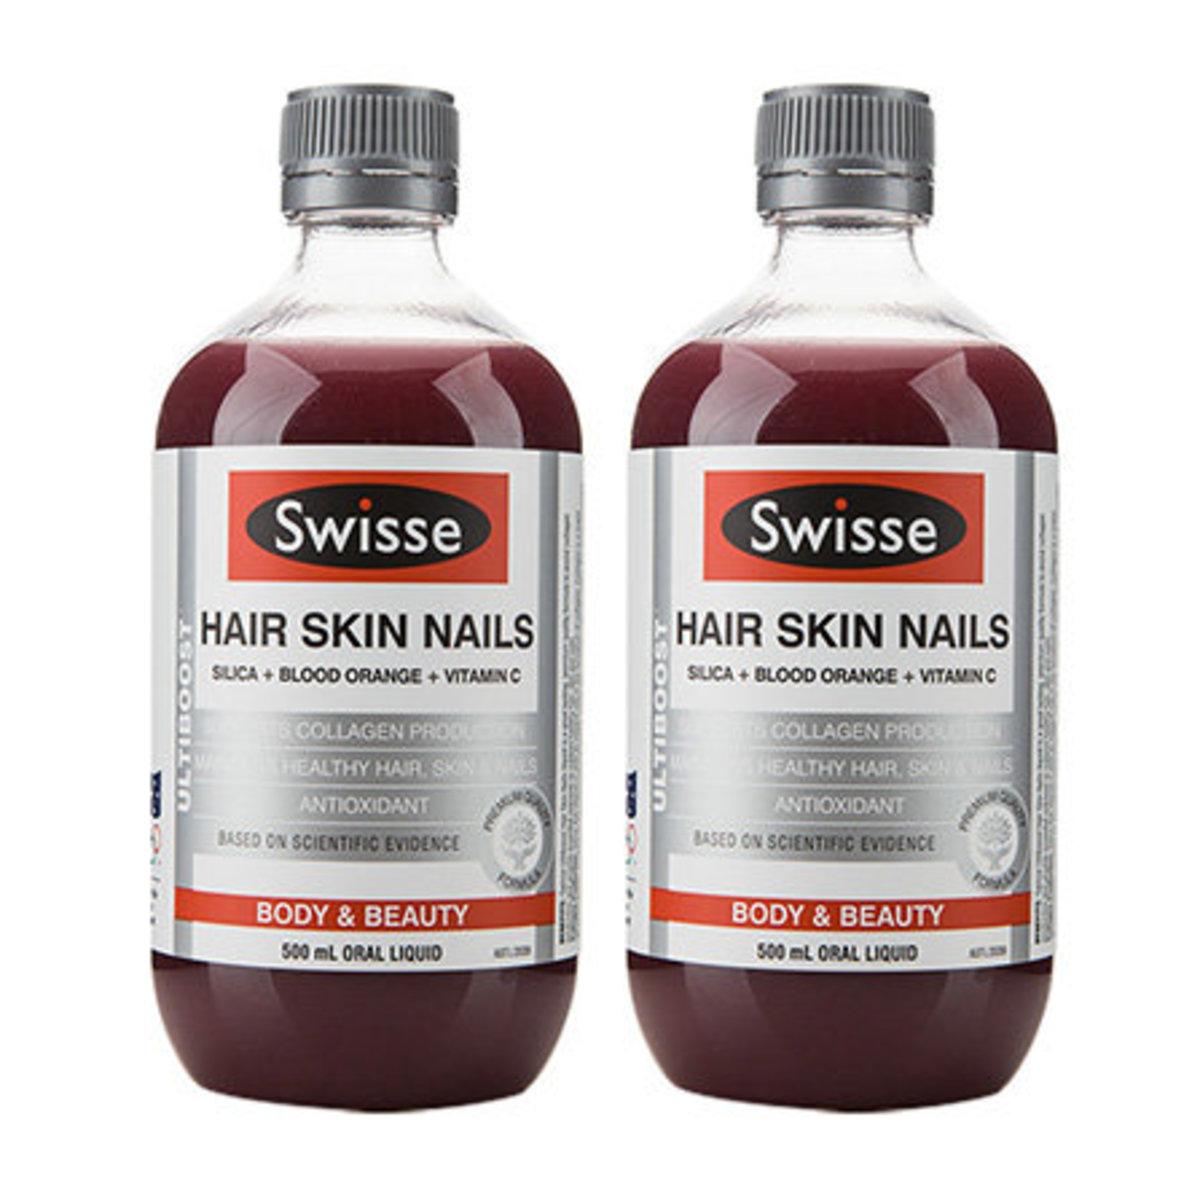 Swisse 澳洲膠原蛋白液(血橙) 500ml 兩支